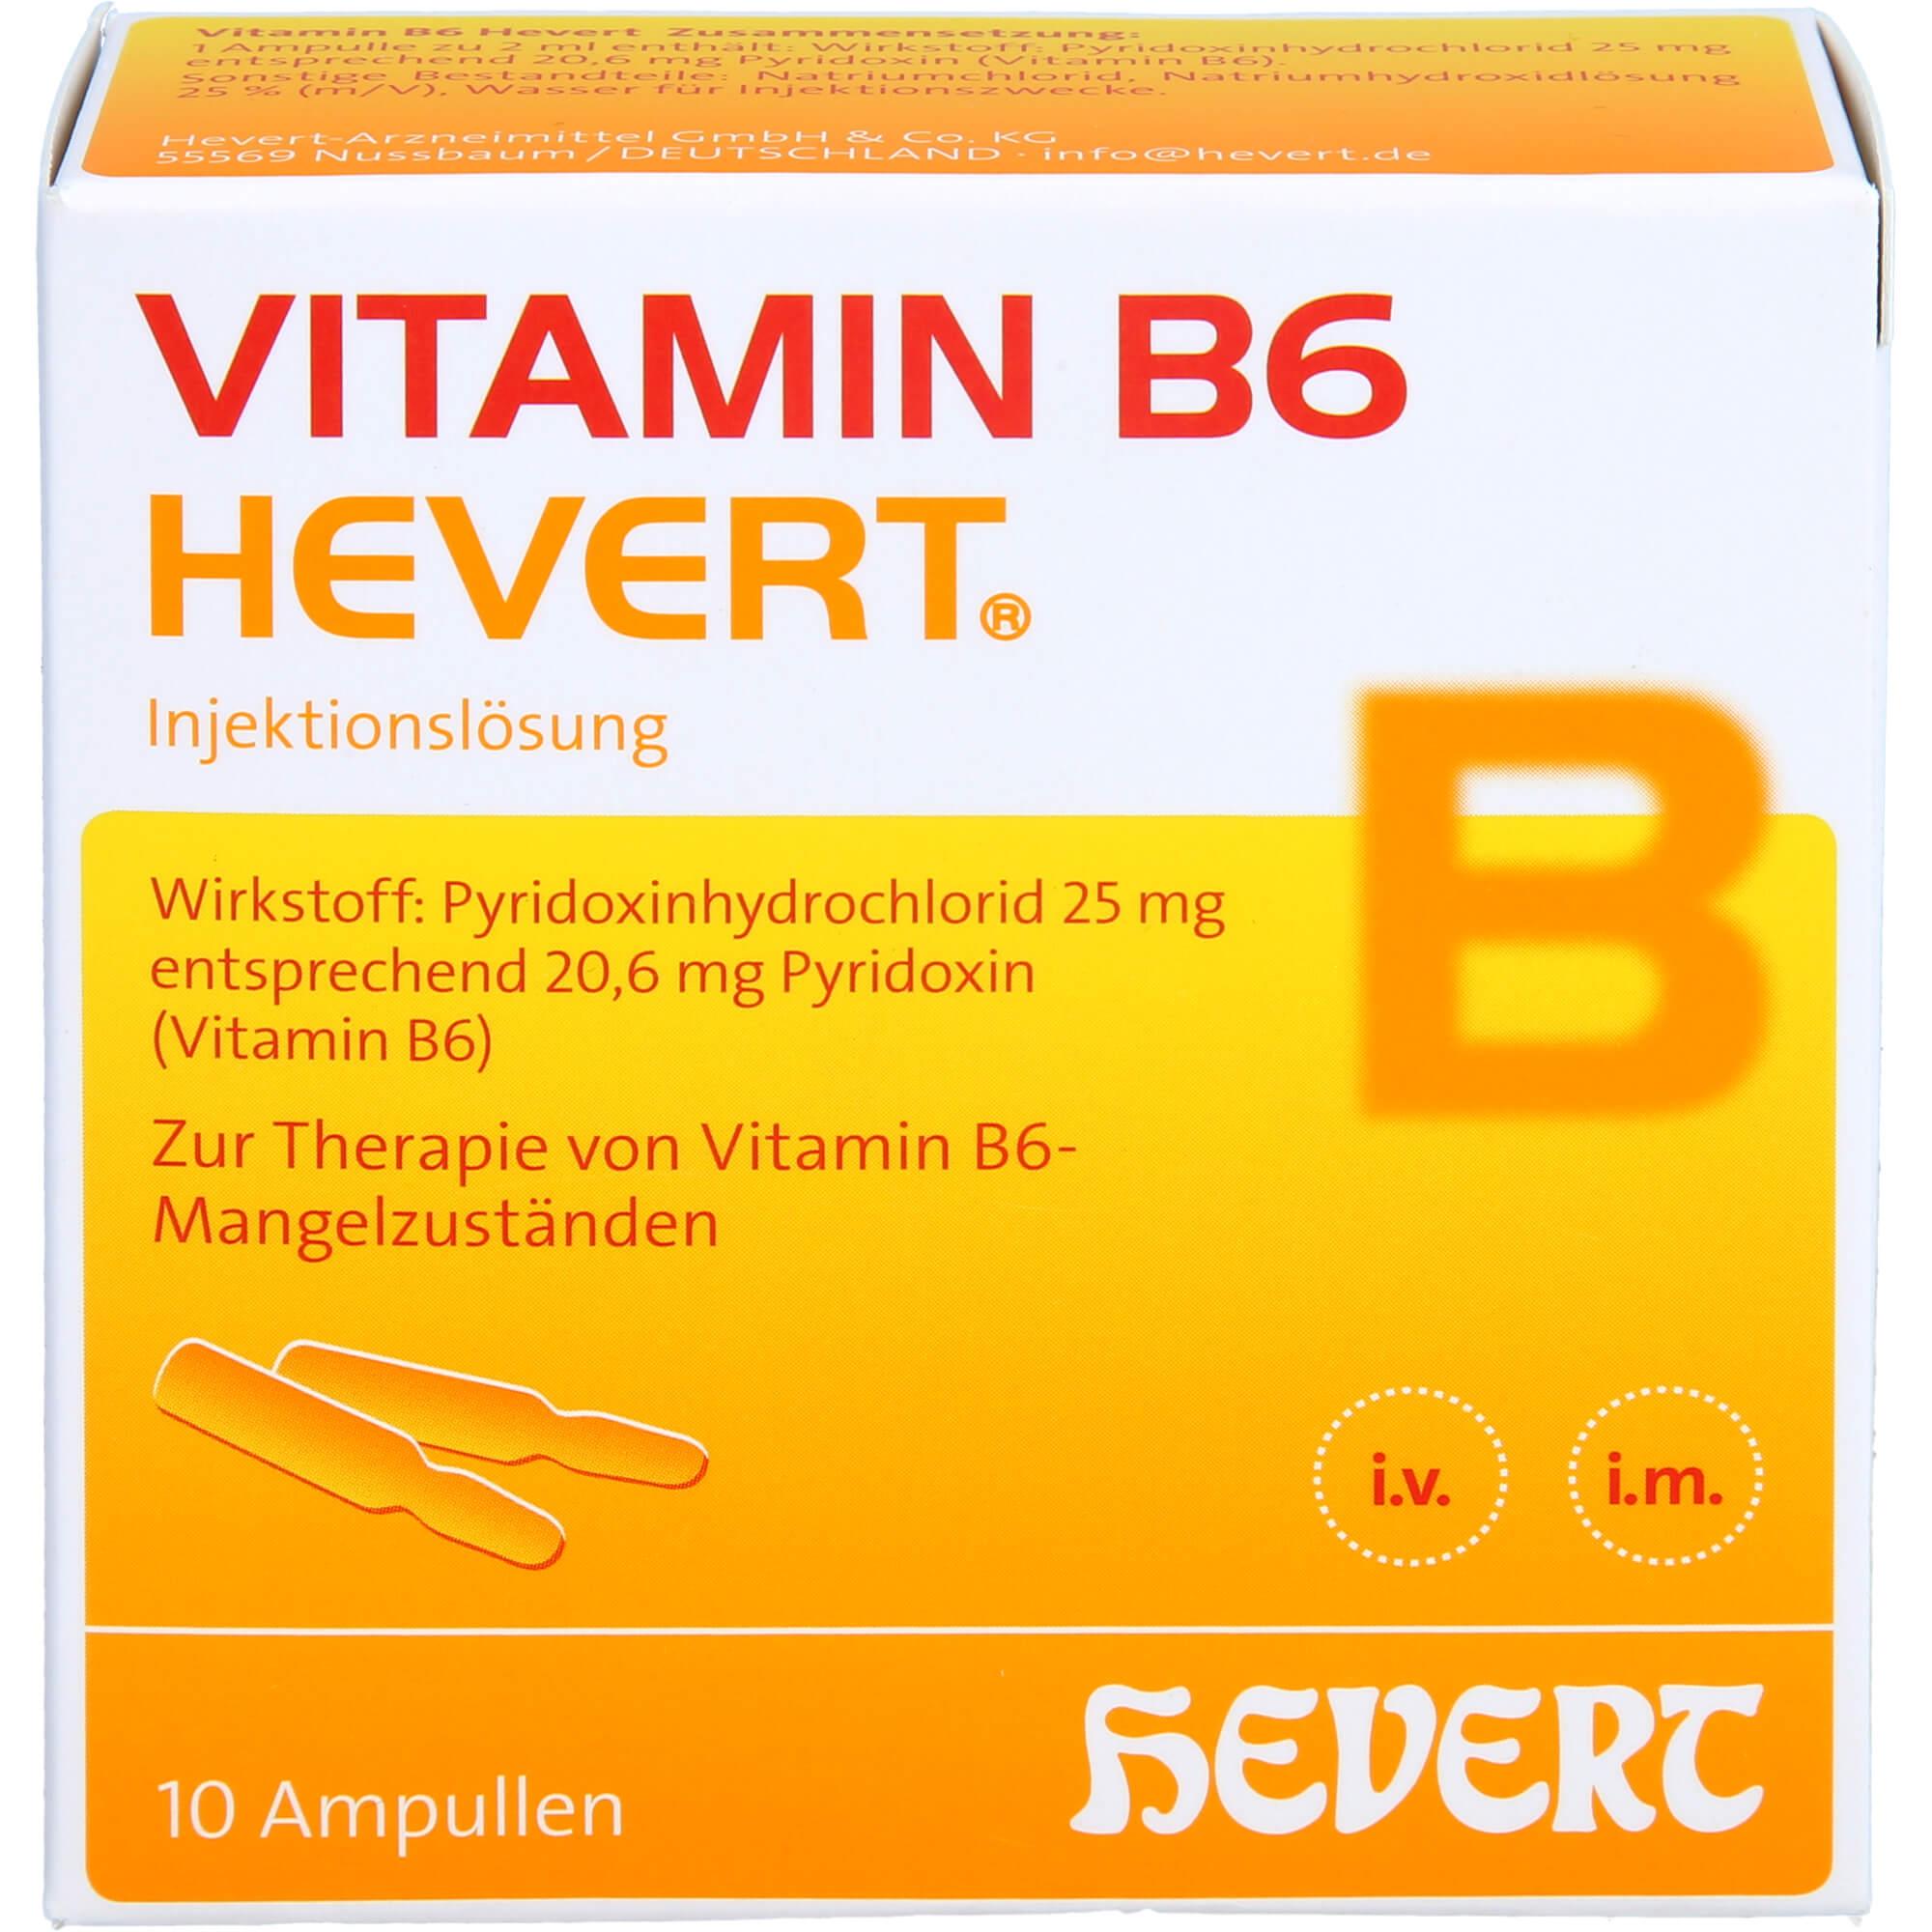 VITAMIN-B6-HEVERT-Ampullen